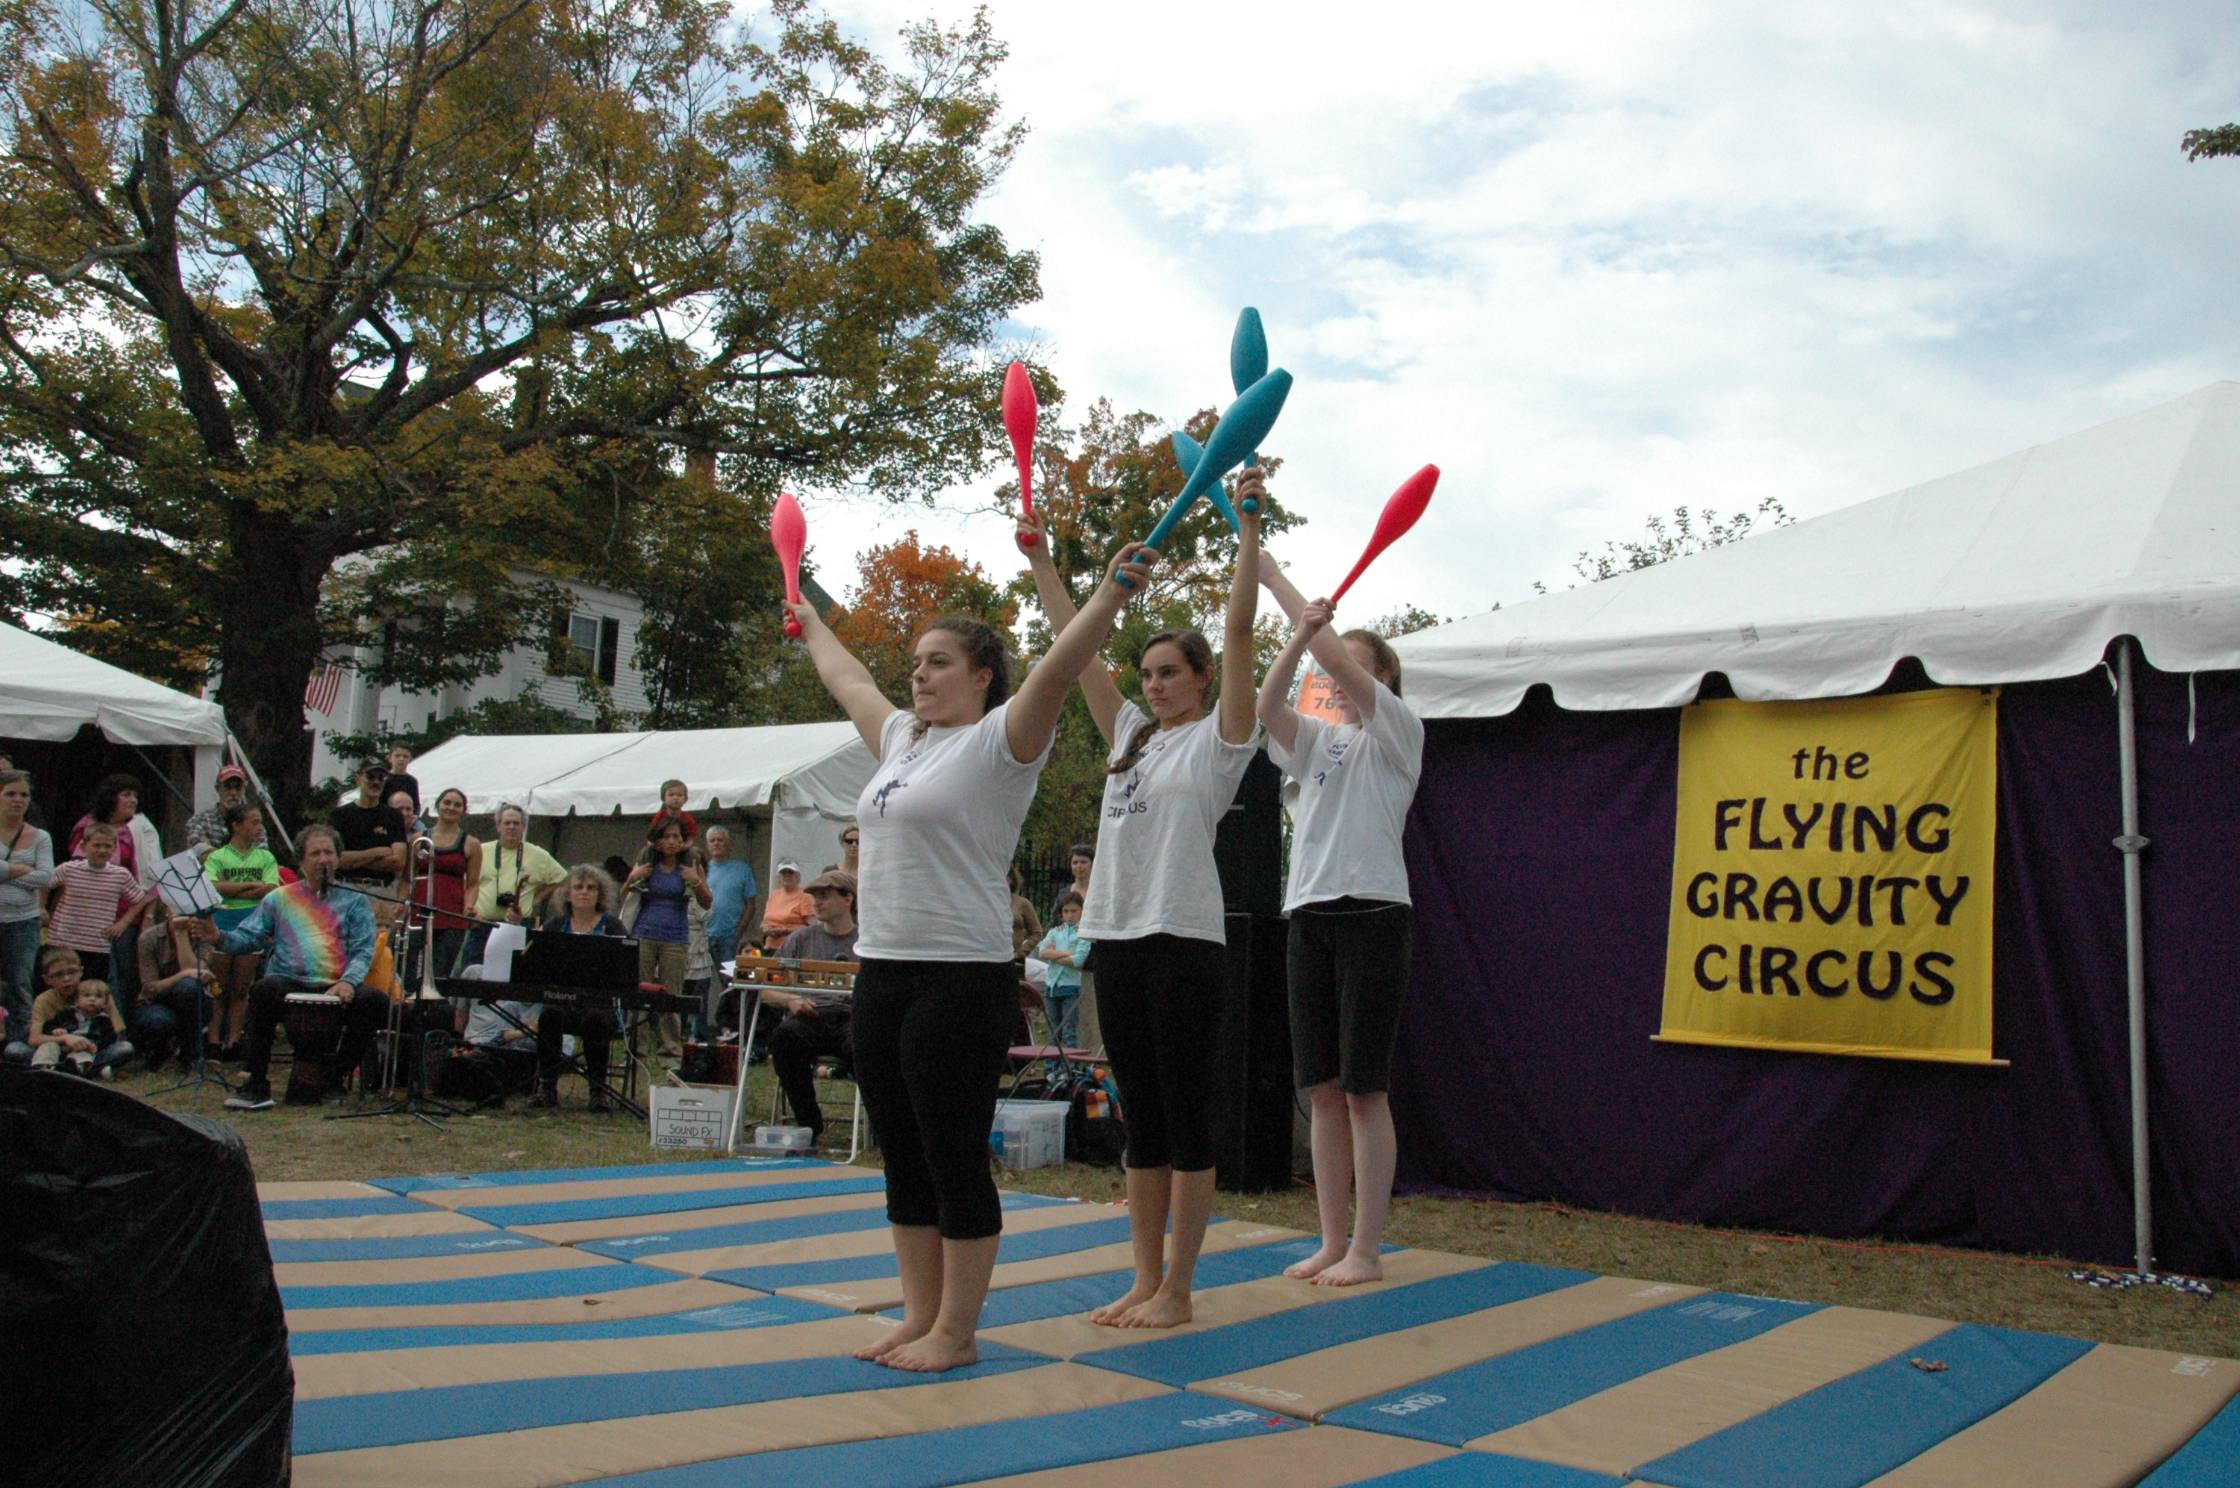 2012-10-06 Flyin Gravity Circus - Pumpkin 110.JPG